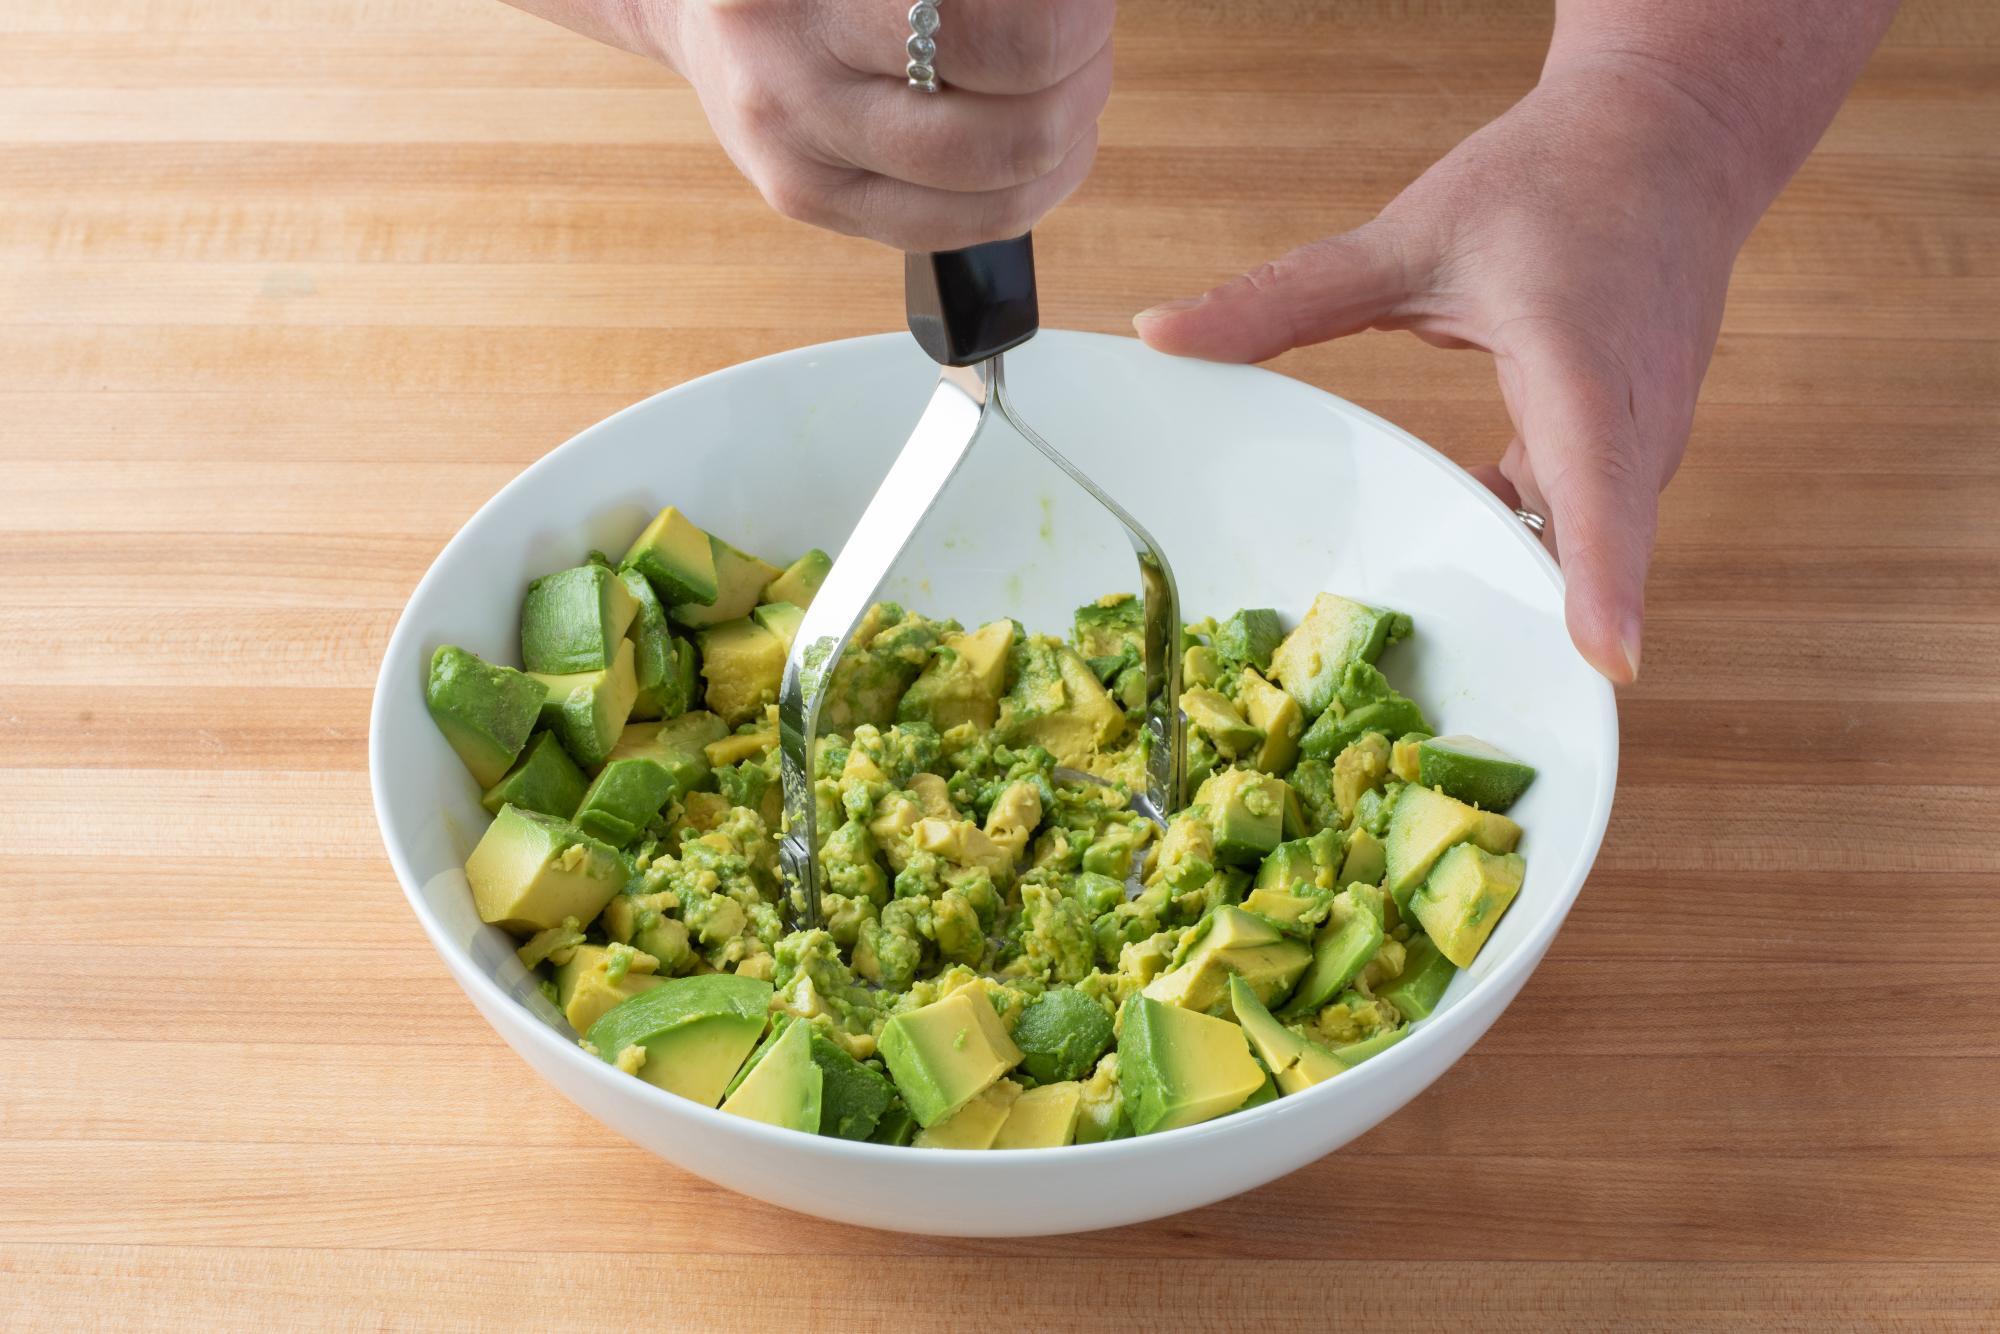 Mashing the avocado with the Potato Masher.